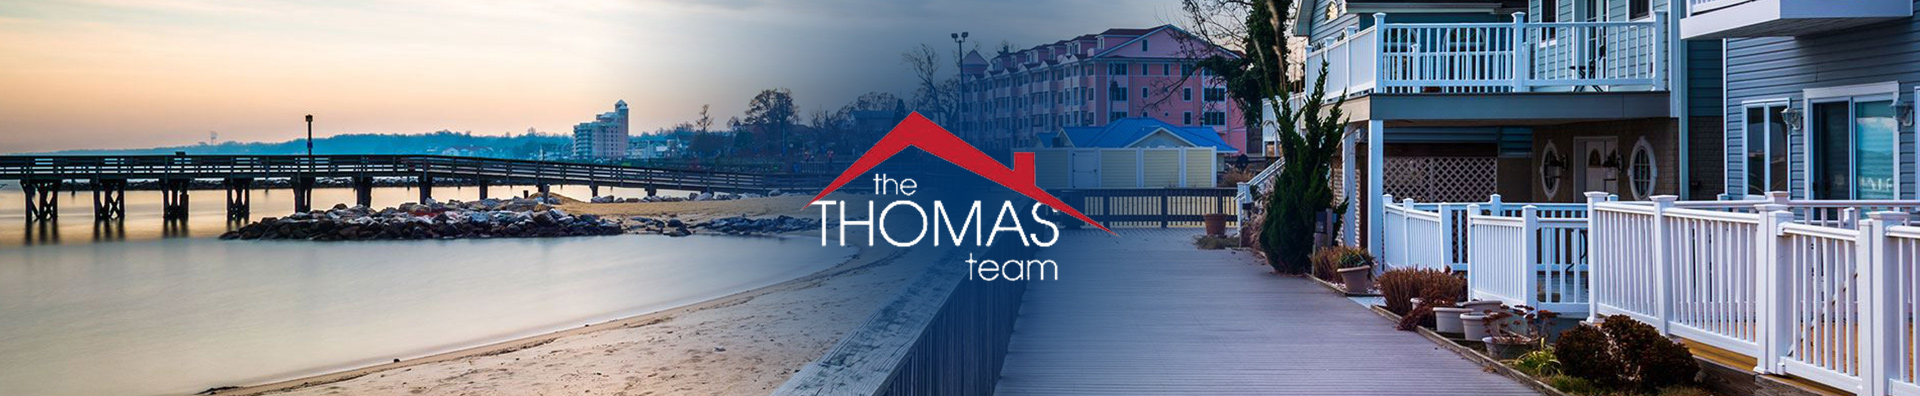 Thomas Team